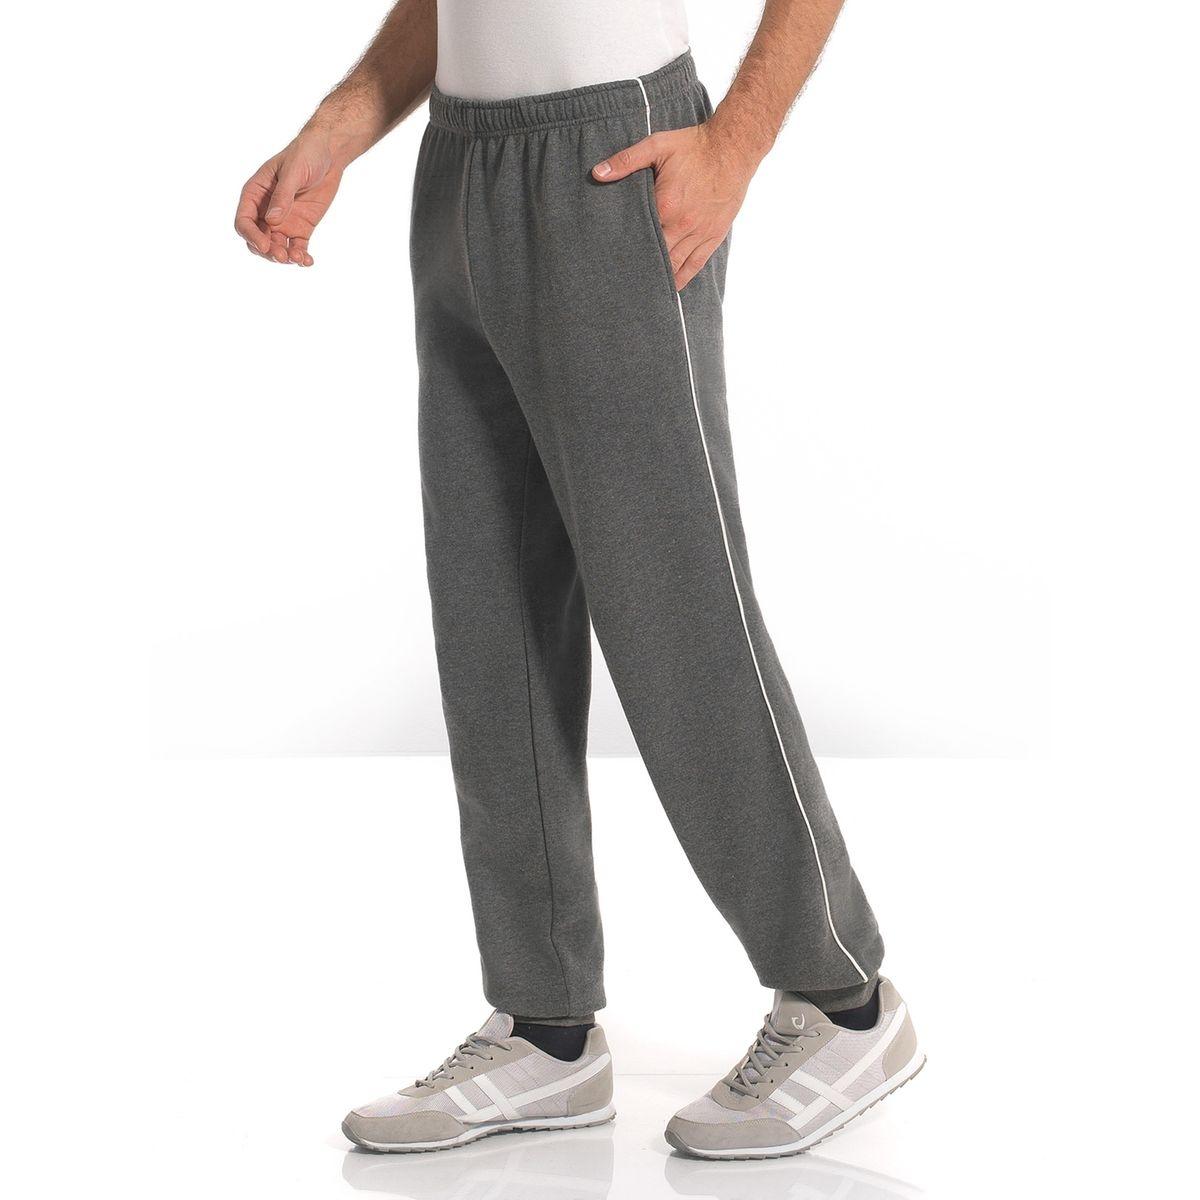 Pantalon de jogging en molleton gratté